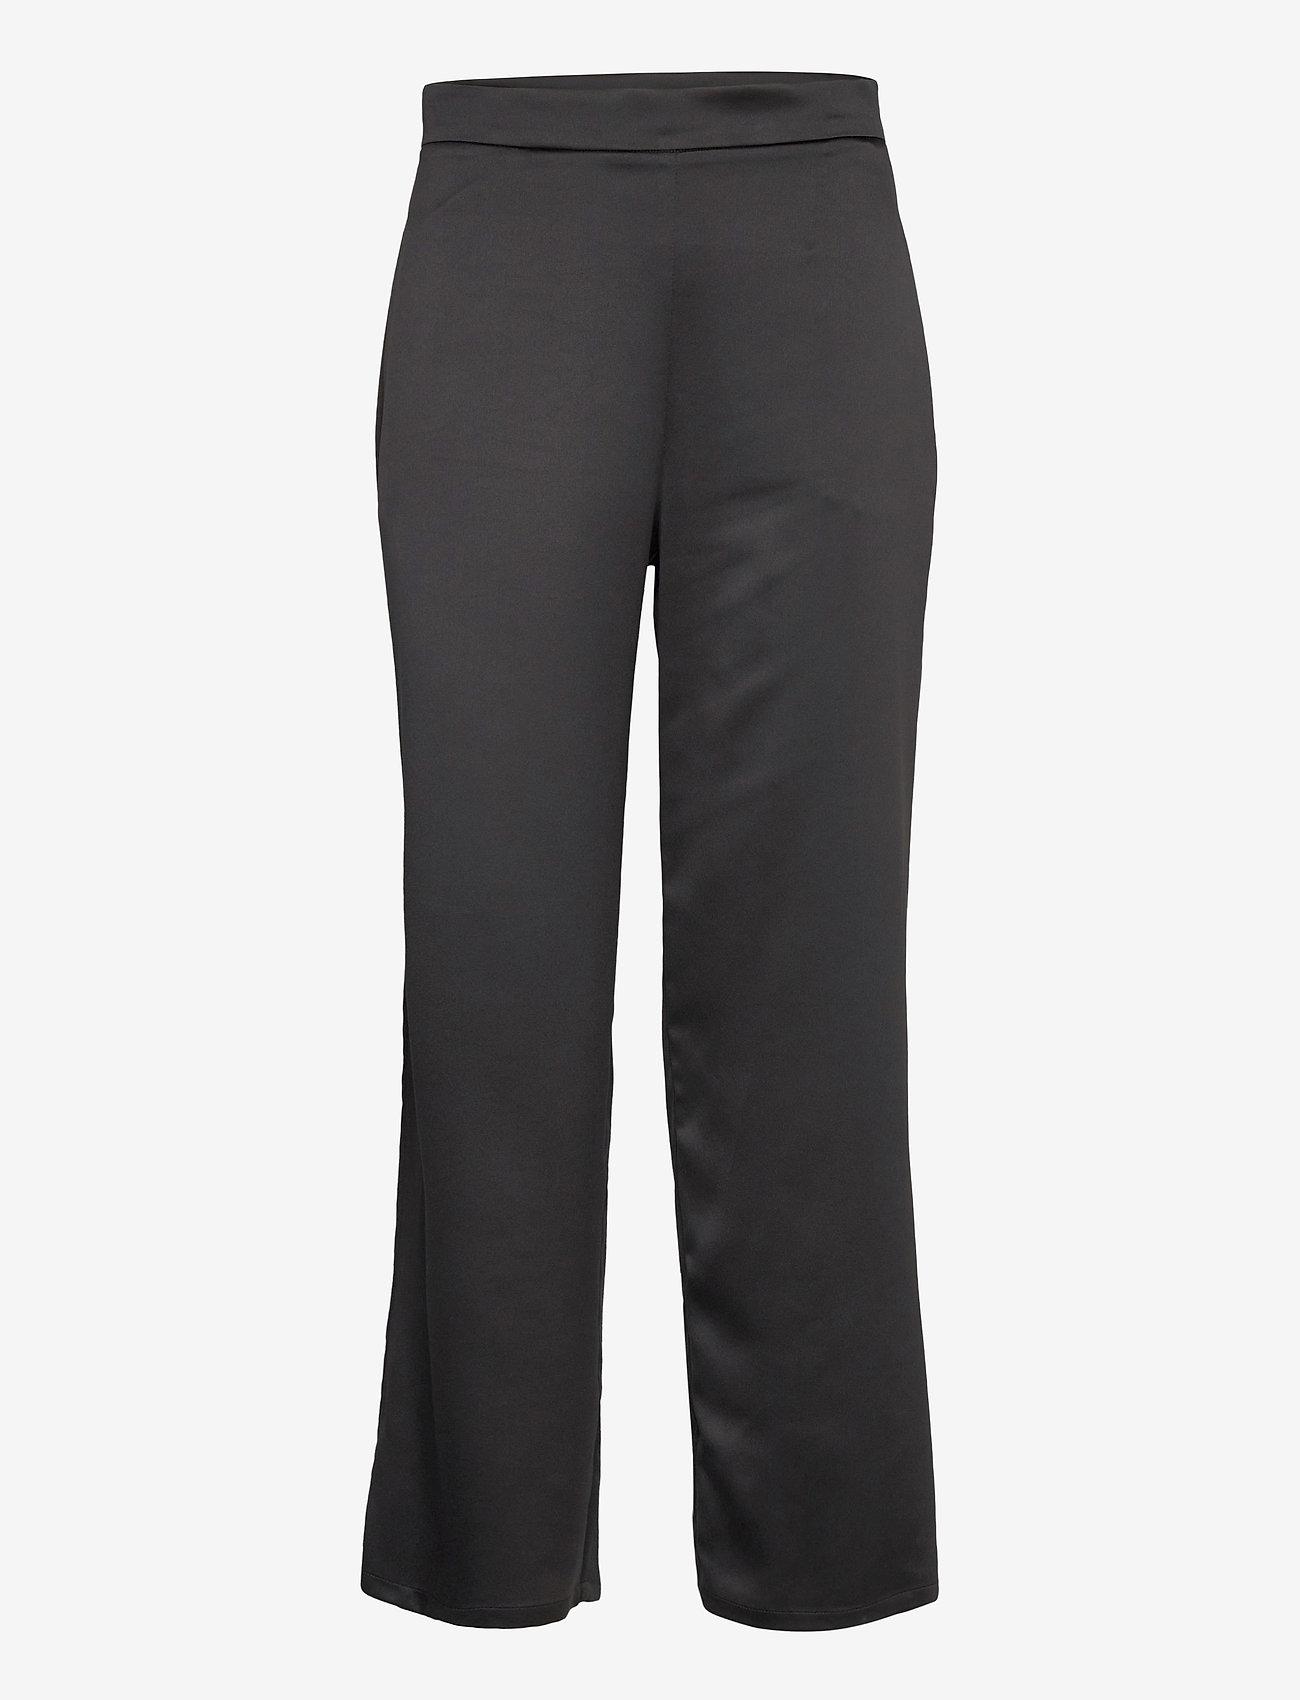 Max Mara Leisure - ENFASI - straight leg trousers - black - 0